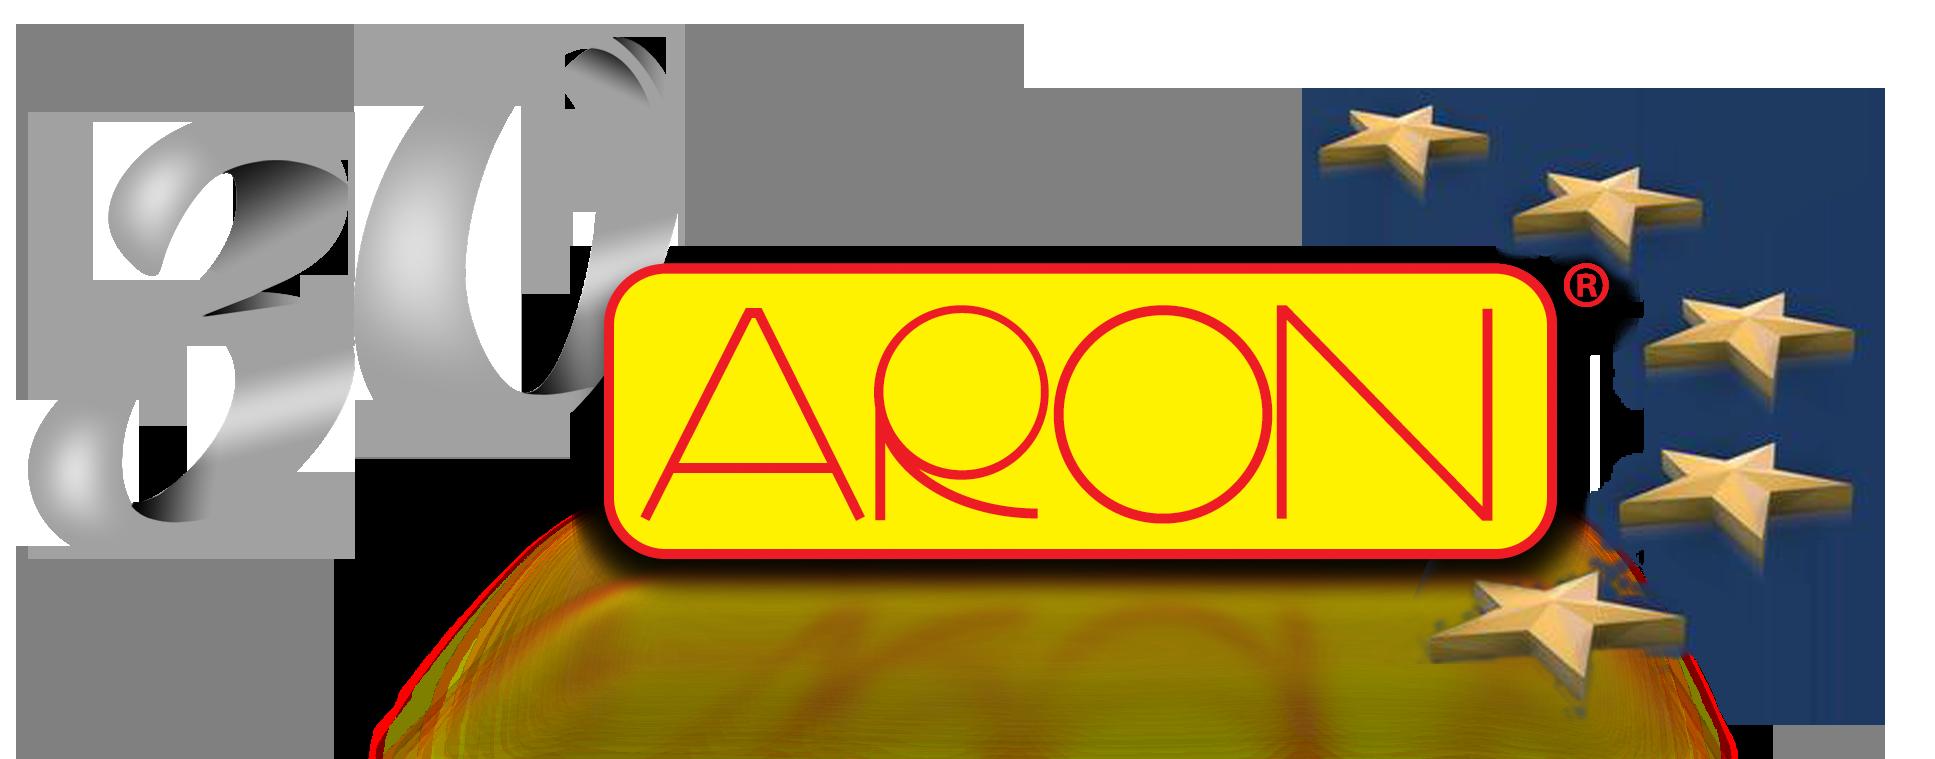 Aron s.r.l.